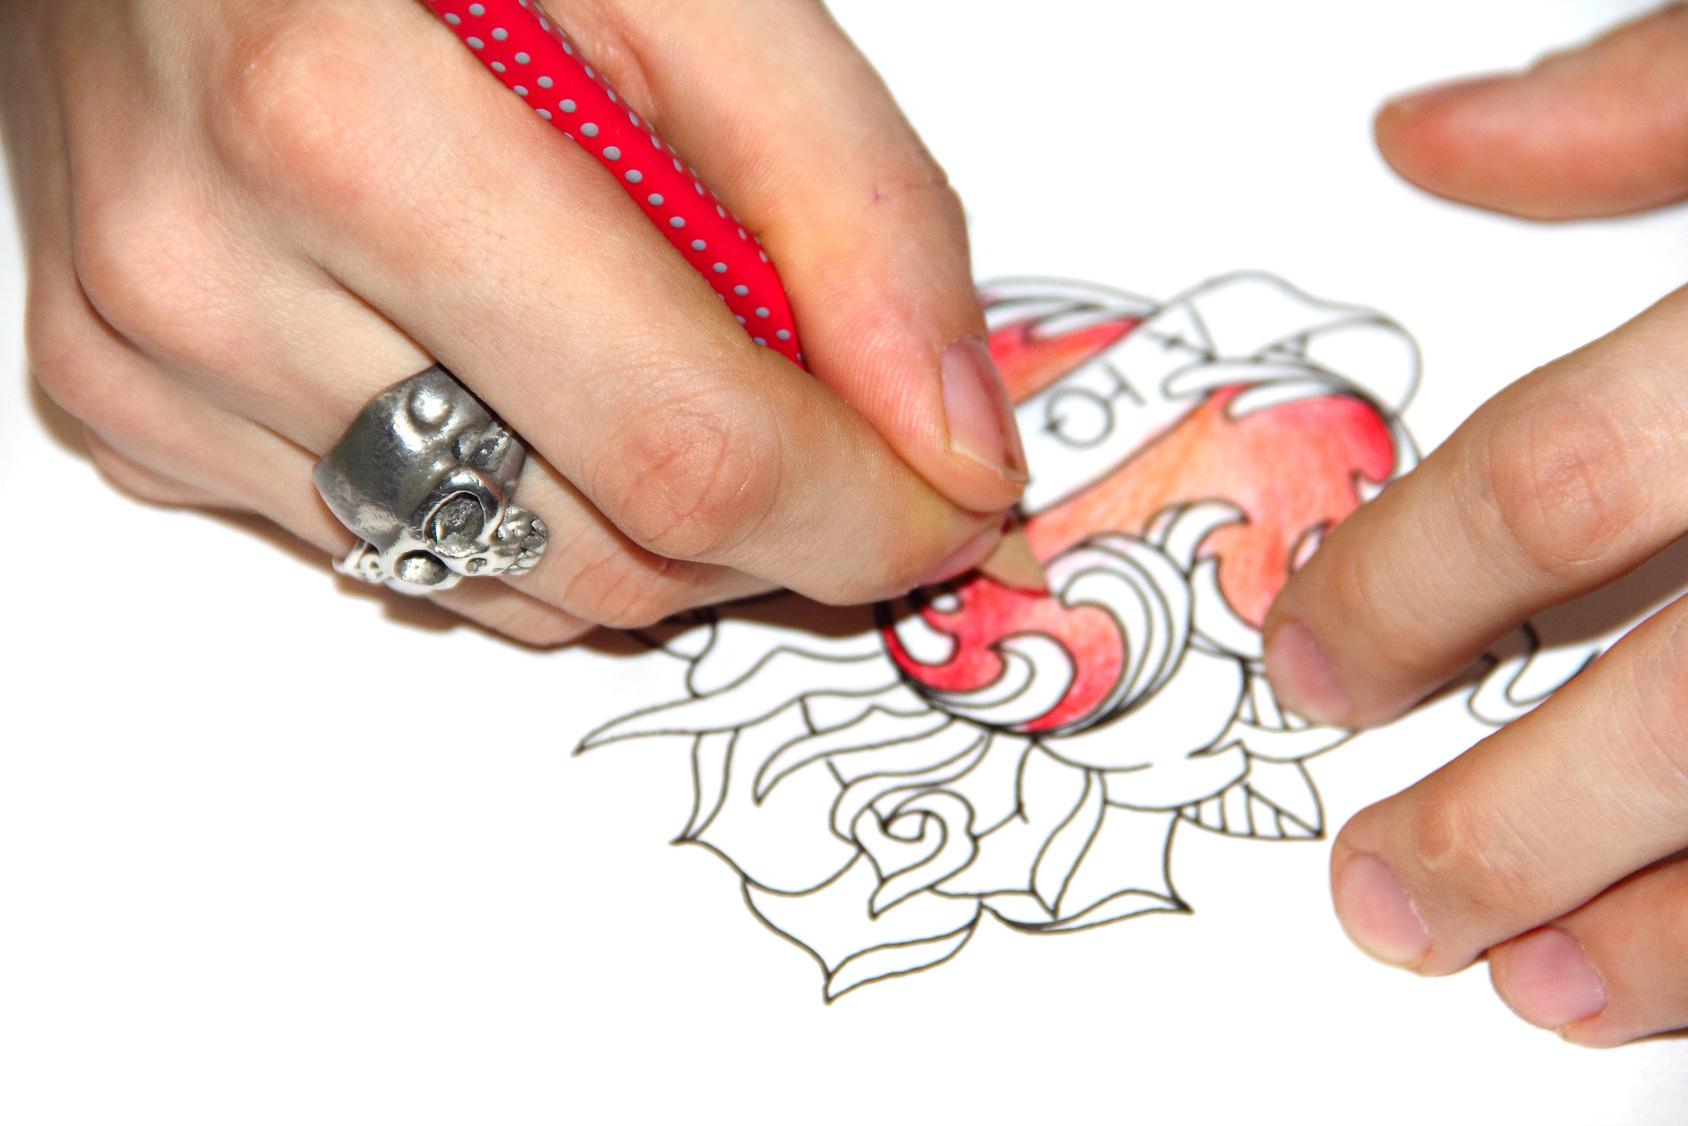 Dessiner son tatouage